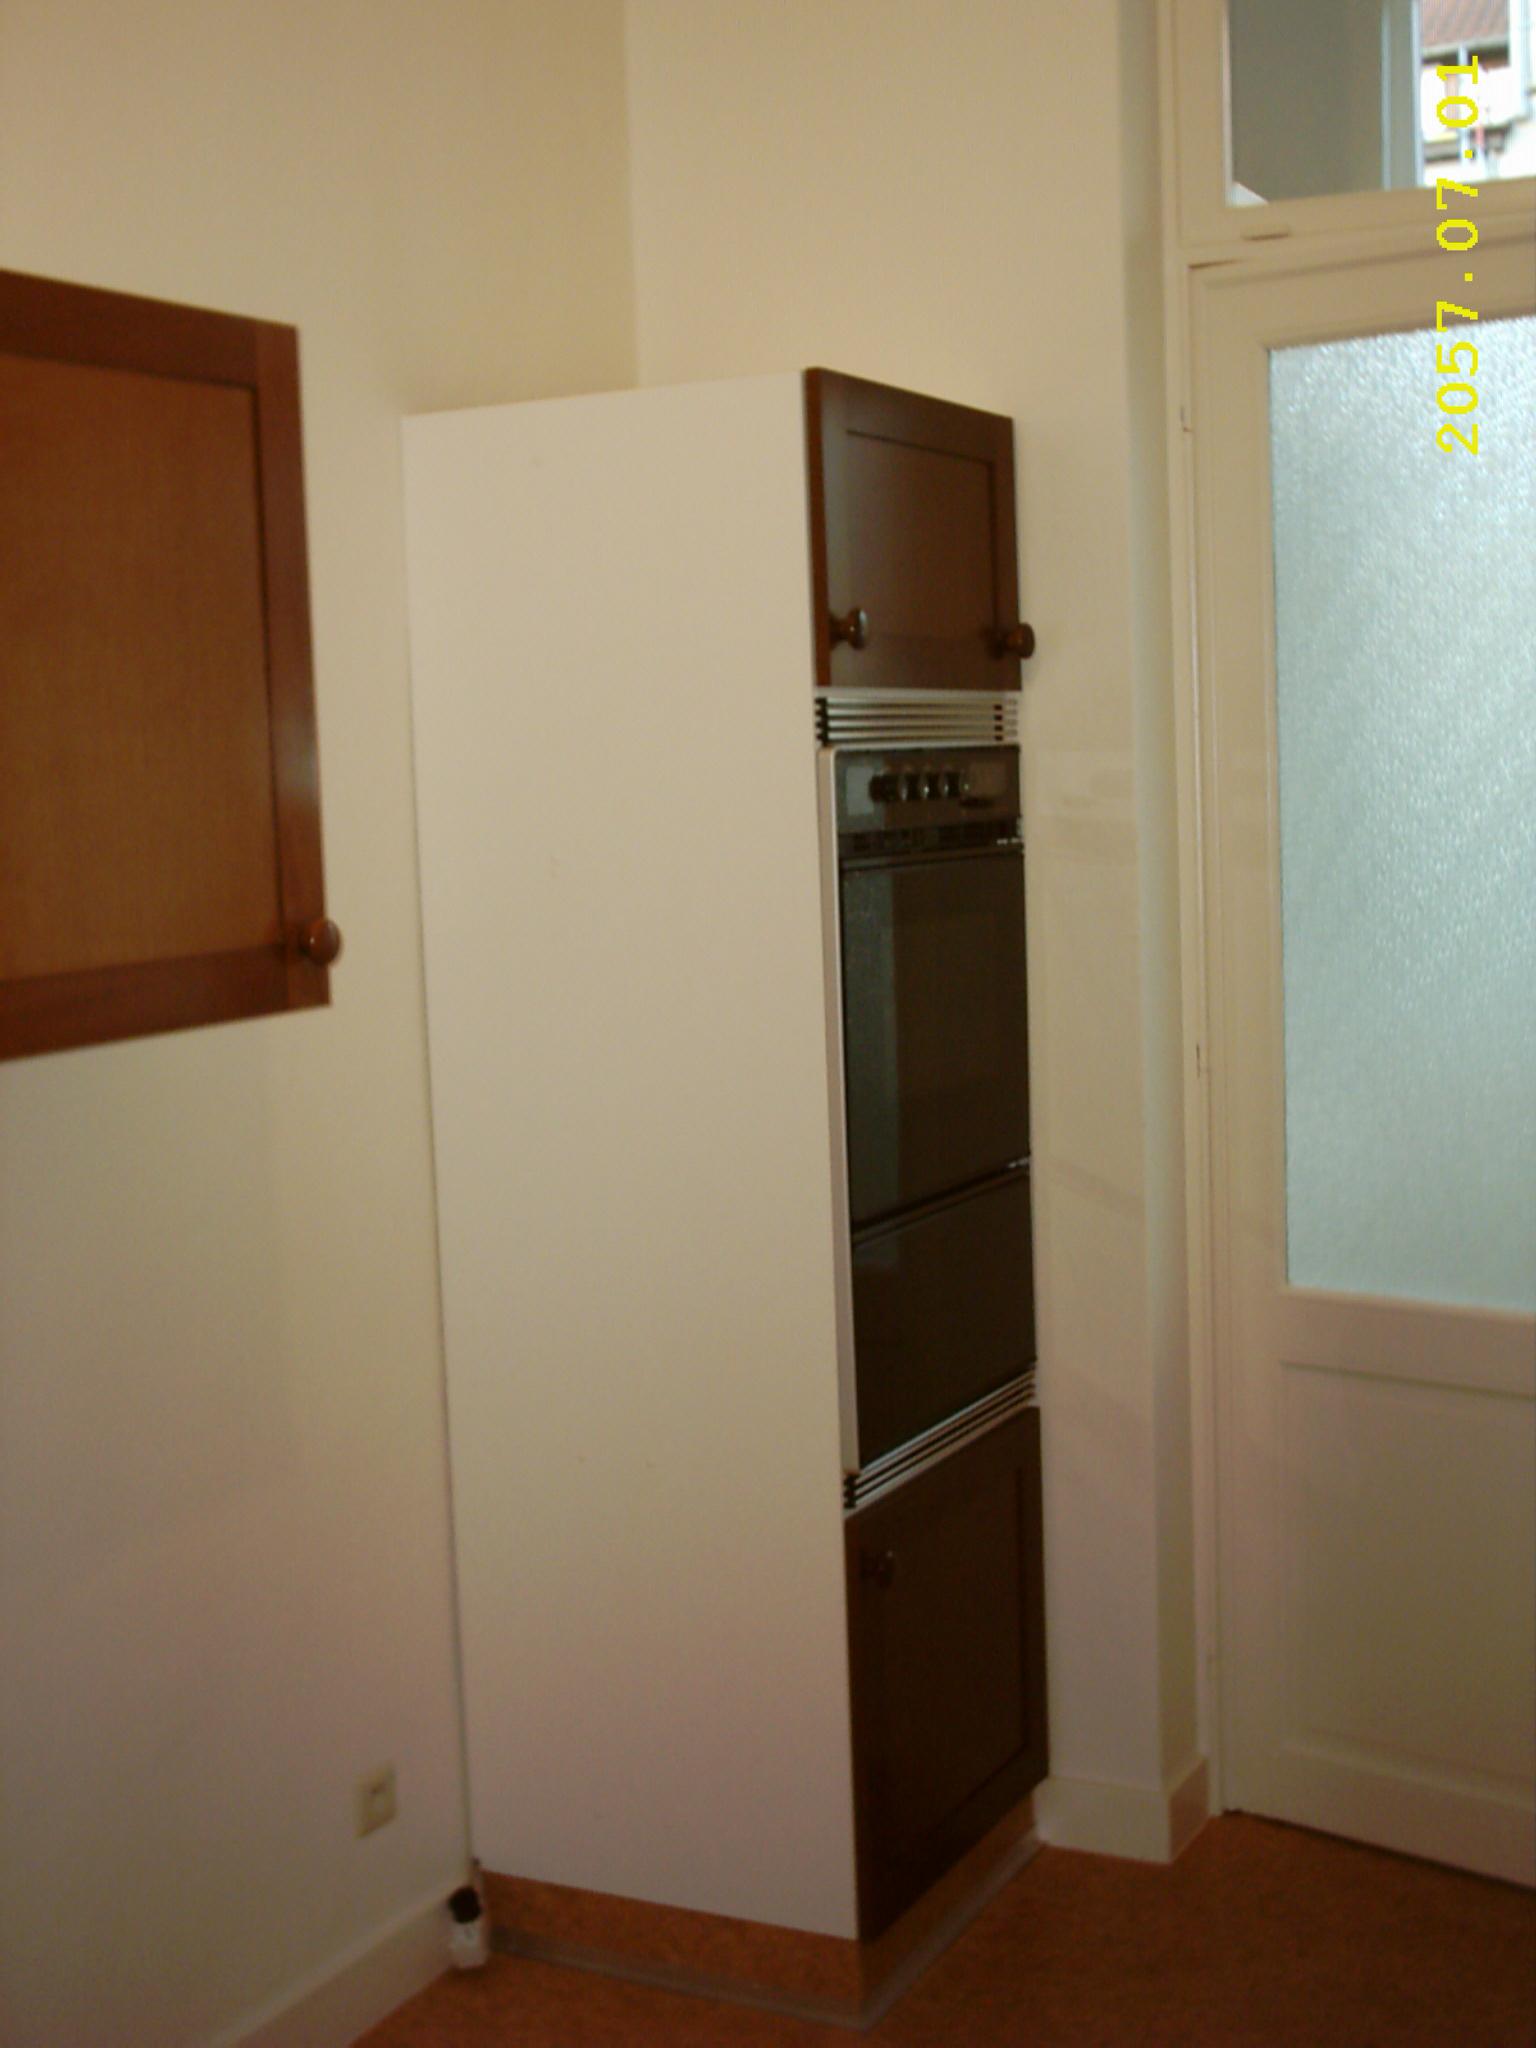 Appartement 1 chambre louer bruxelles 1000 immo particulier - Appartement 1 chambre a louer bruxelles ...